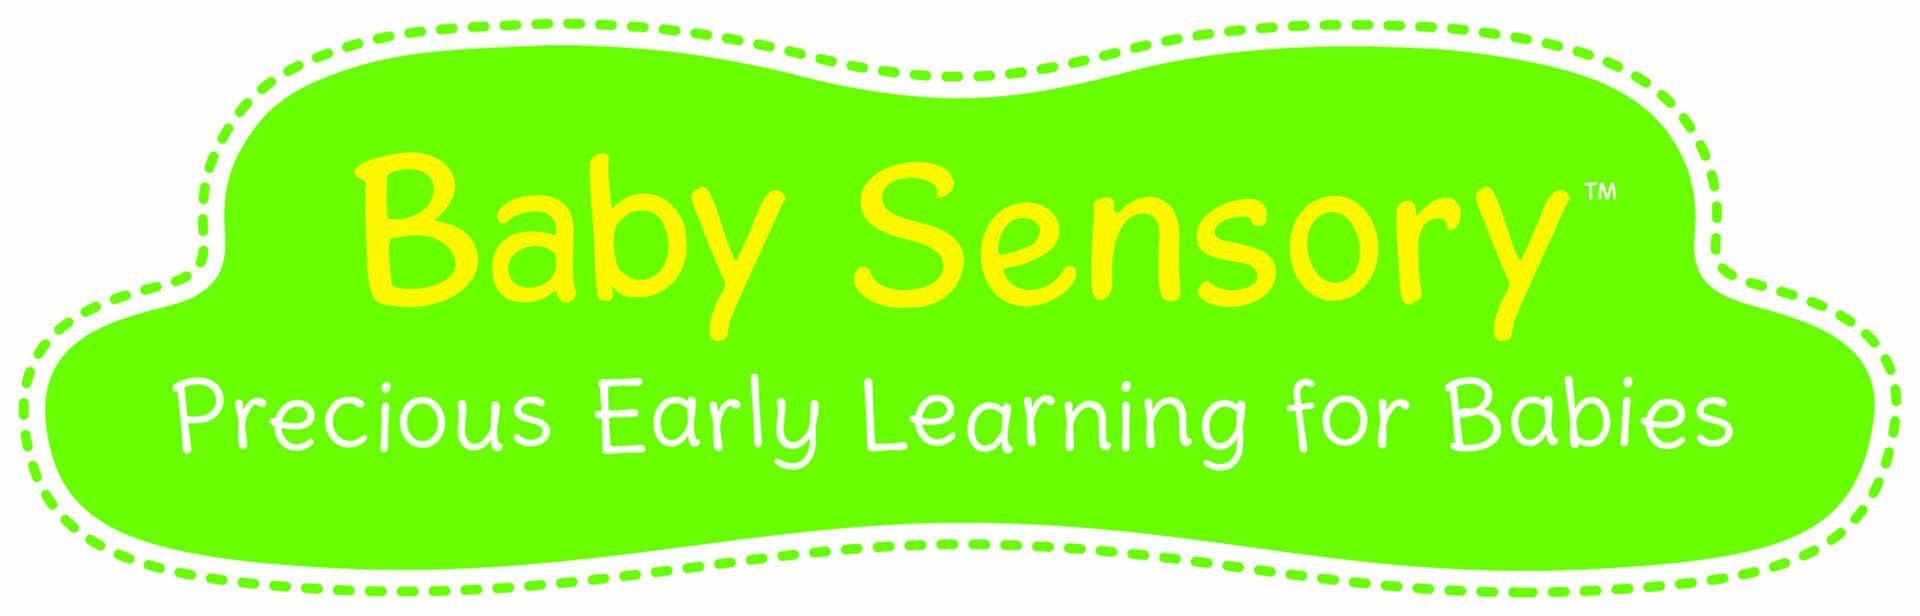 Baby Sensory Grantham, Melton & South Notts's logo